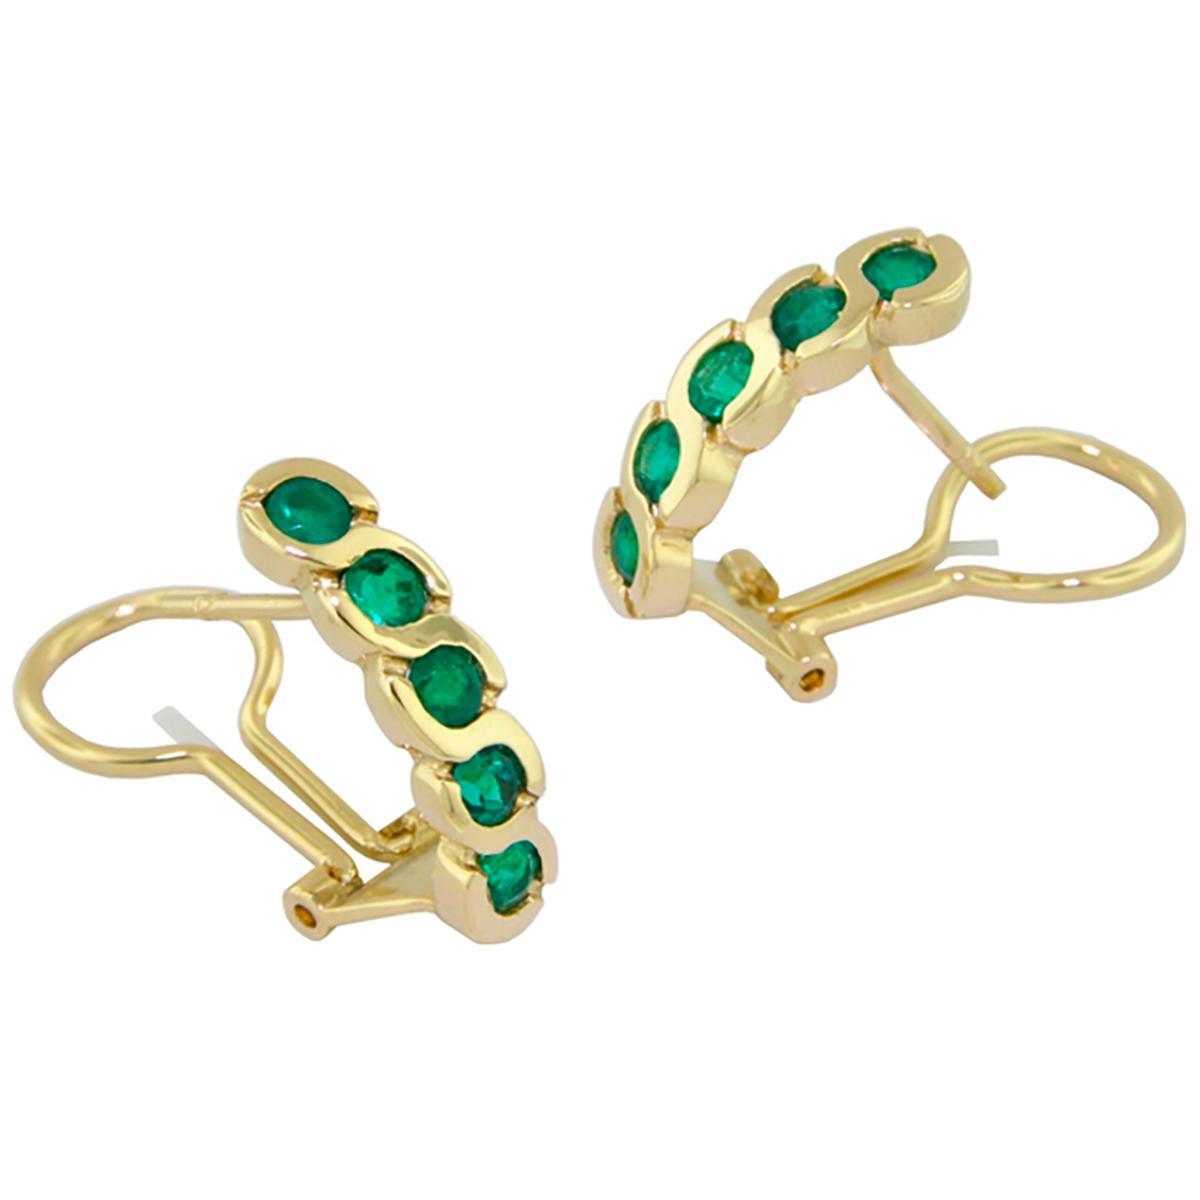 drop-emerald-earrings-in-18k-yellow-gold-bezel-setting-with-clip-backs